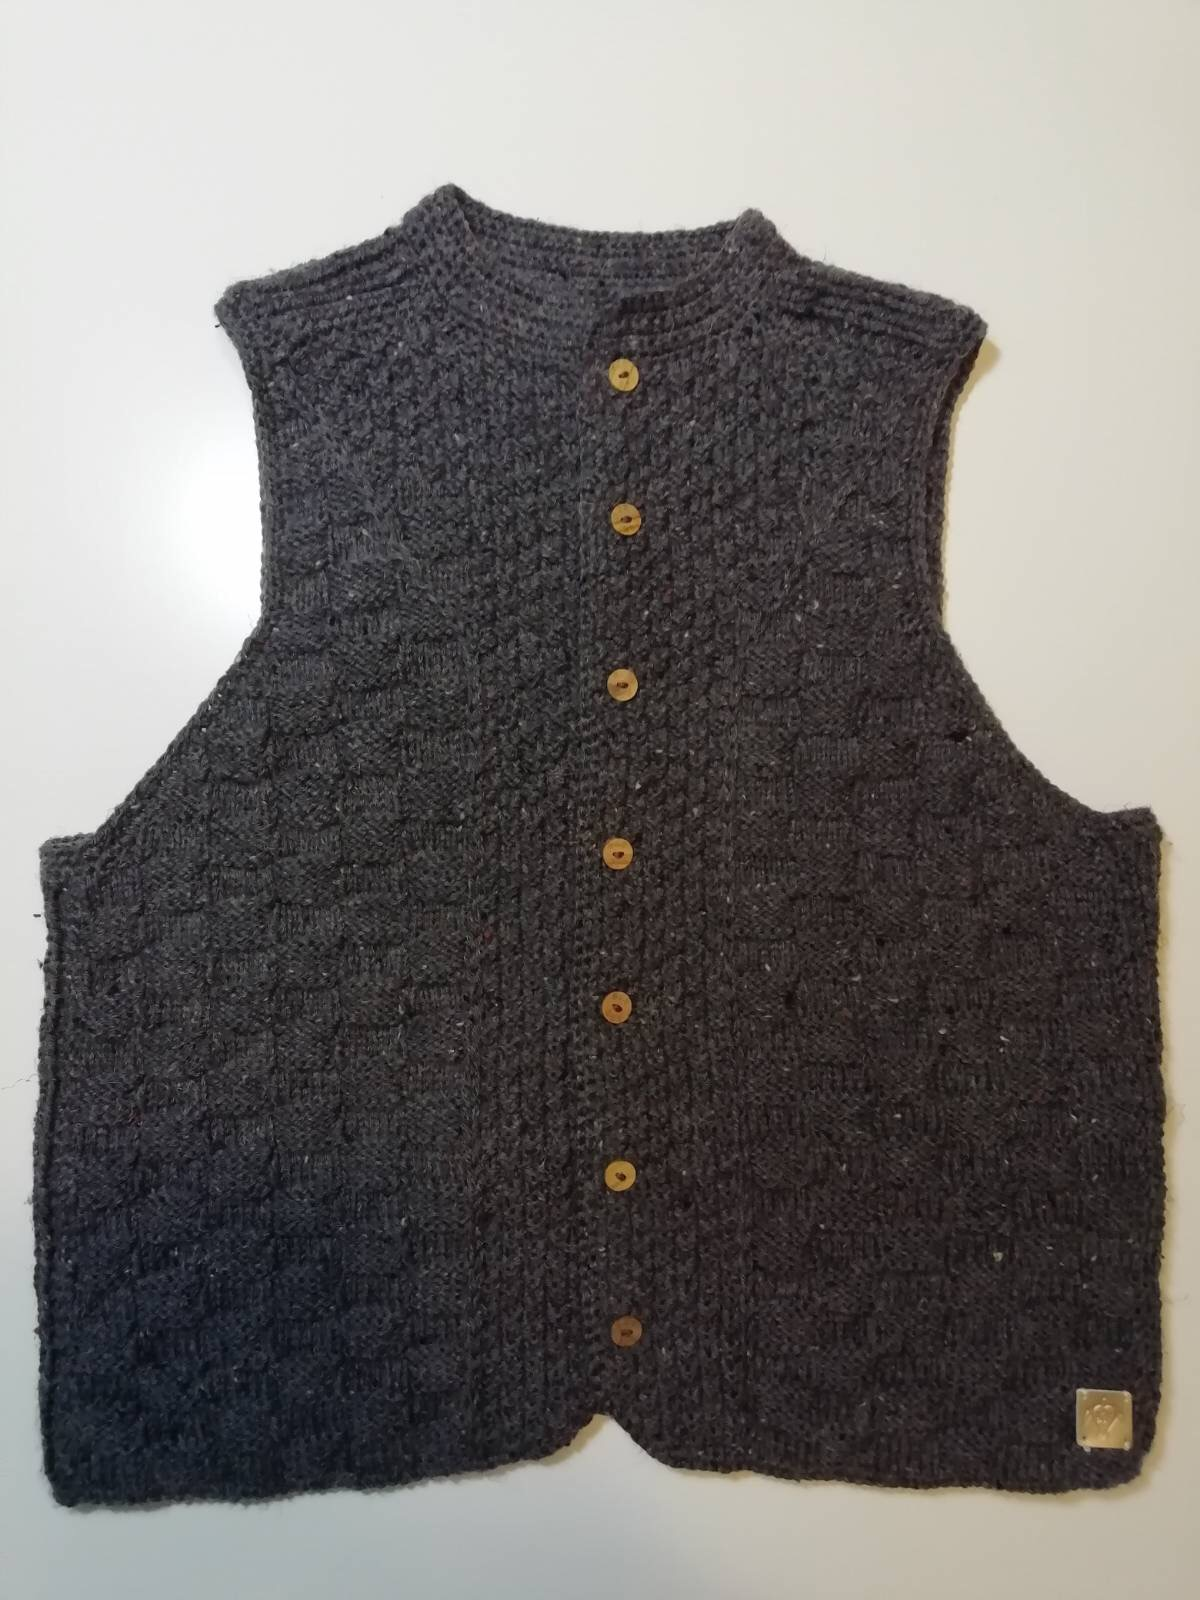 Handmade knitted vest dark grey